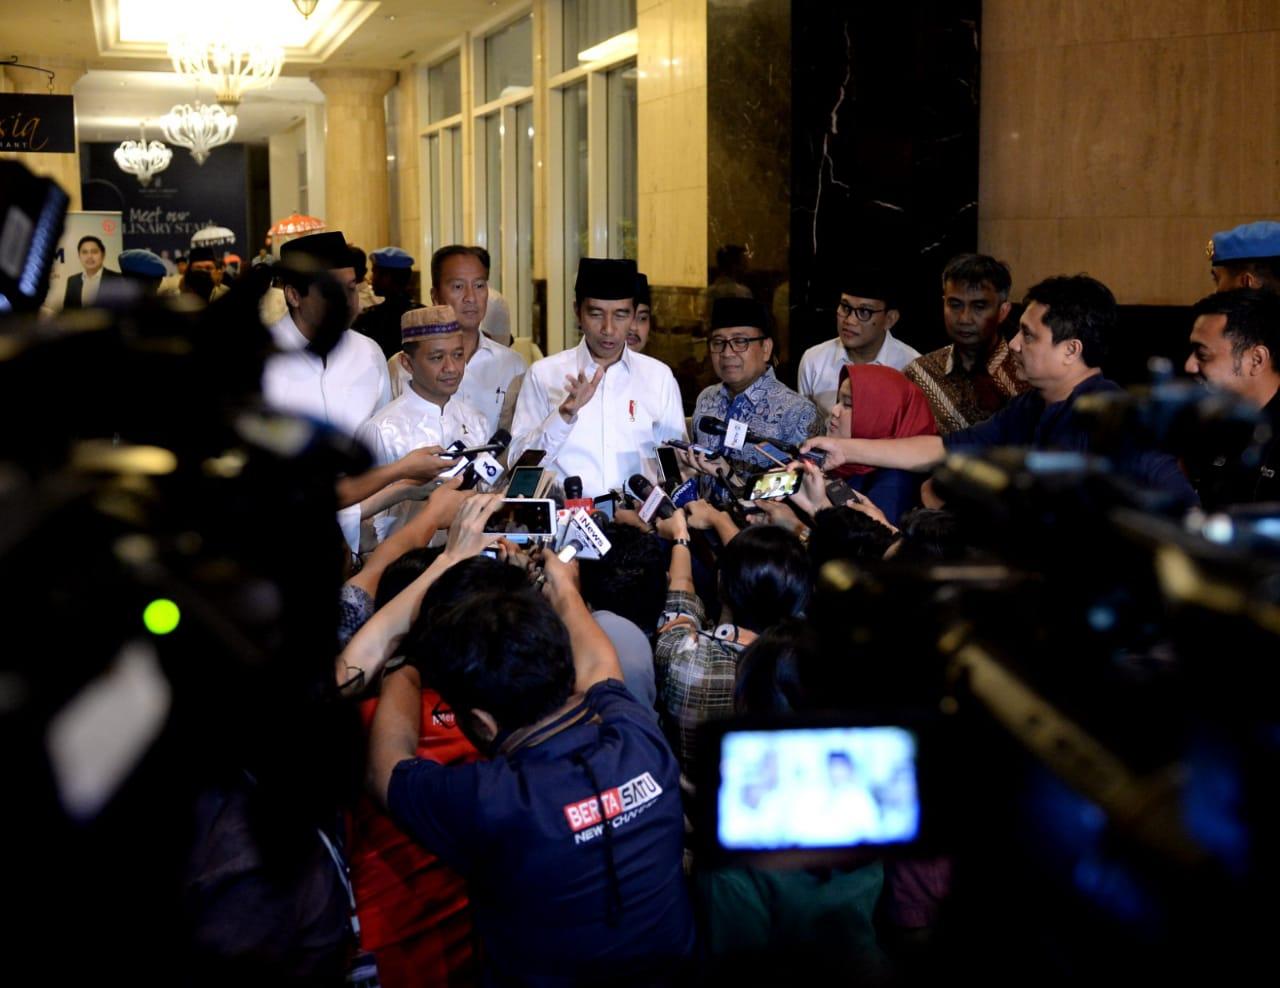 https: img.okezone.com content 2019 05 27 320 2060719 presiden-ungkap-syarat-bagi-indonesia-agar-jadi-negara-maju-AUKdAxQxmT.jpg